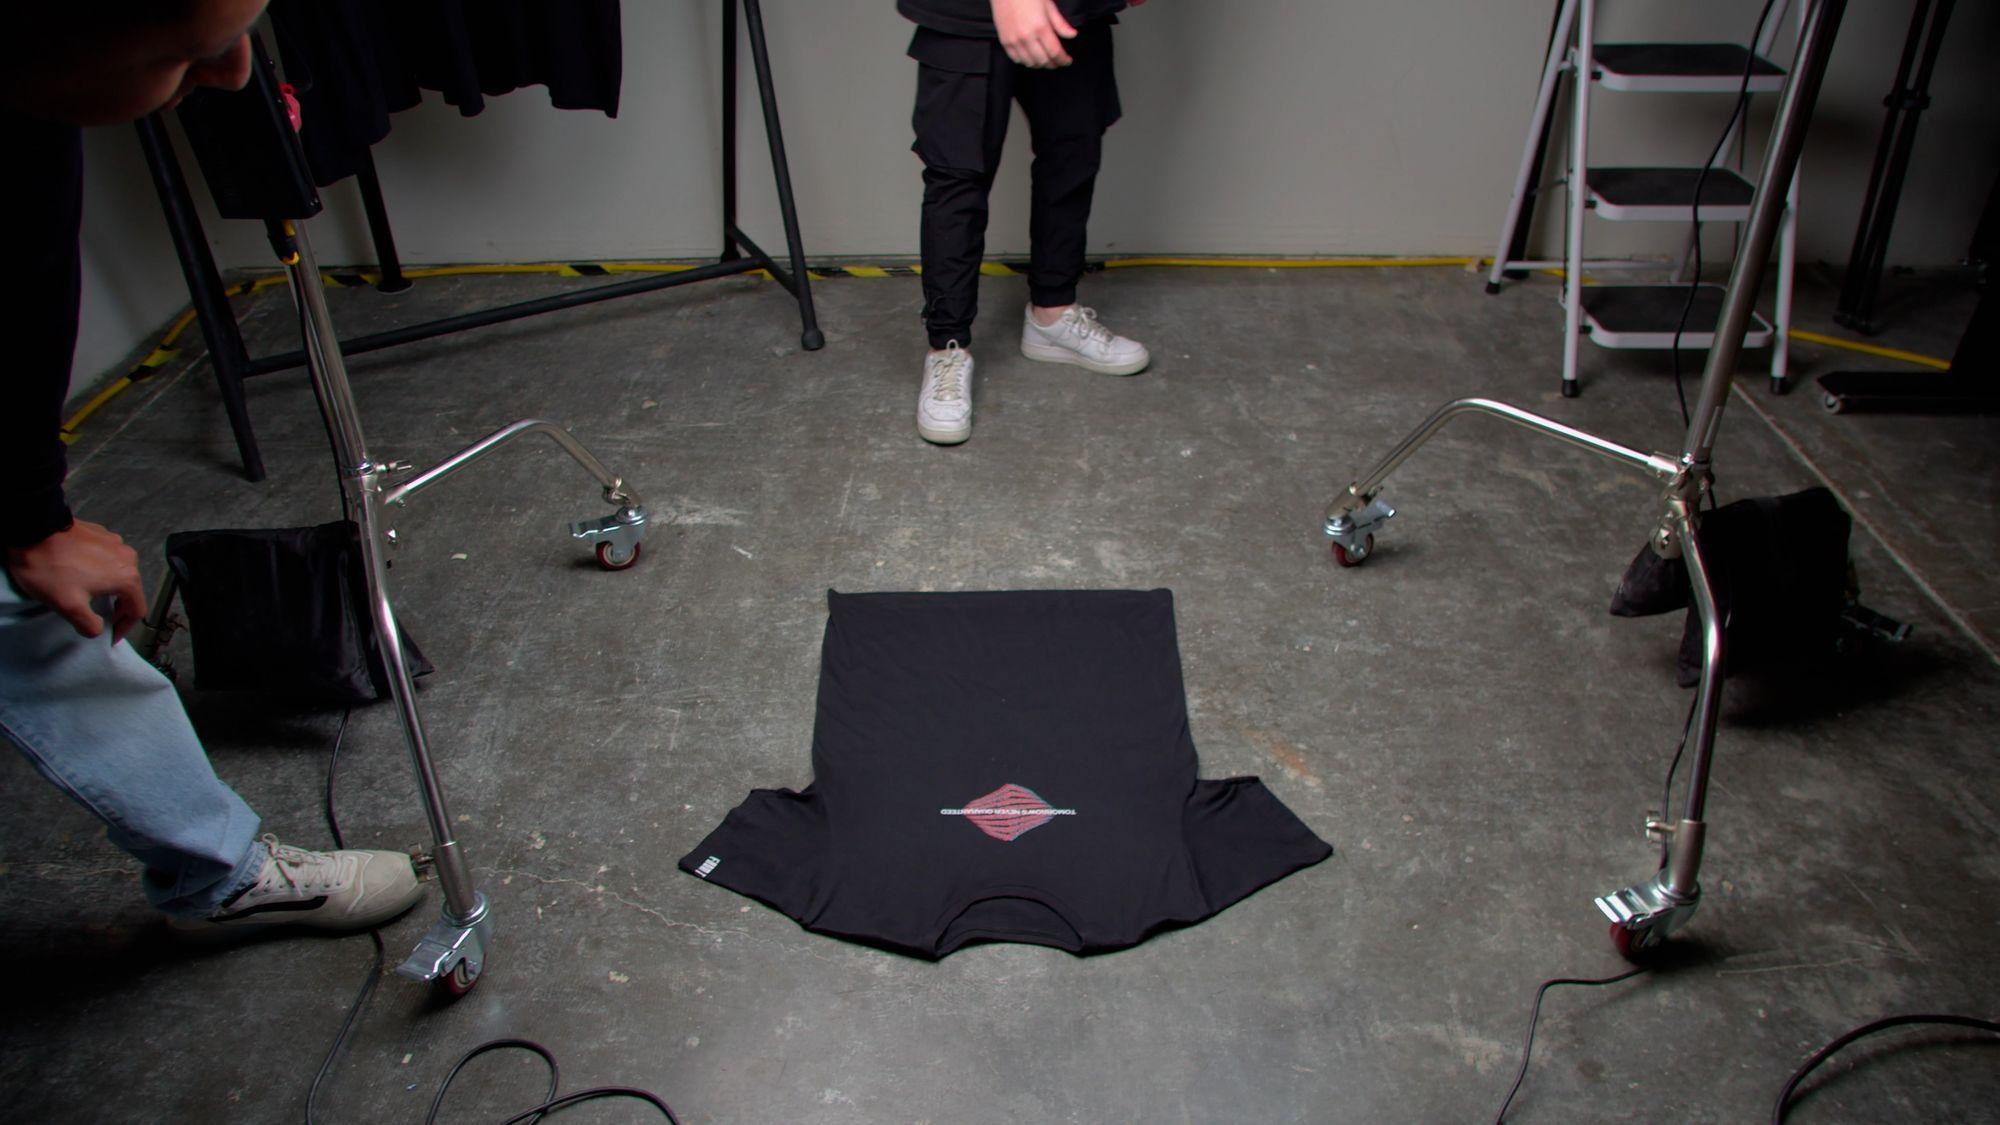 Image of Flat Lay Photography Method